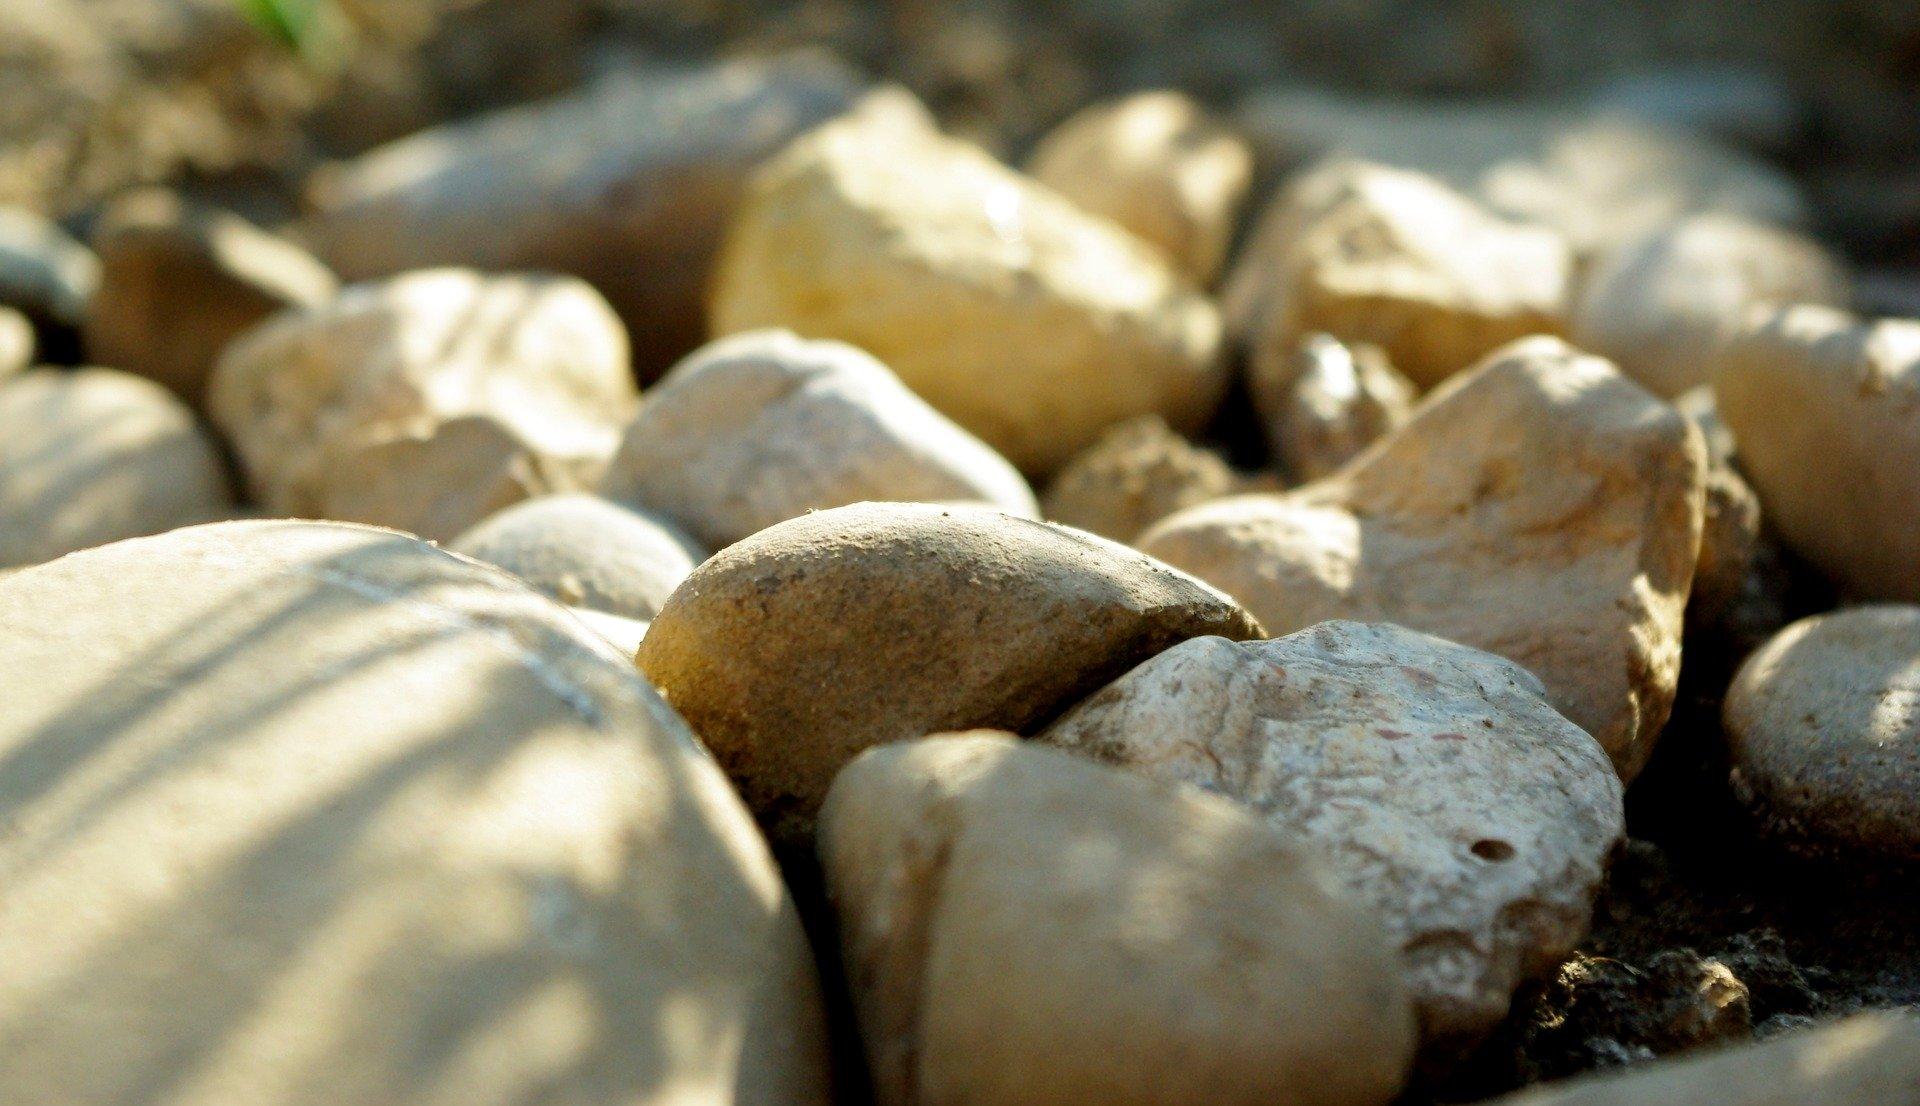 stones nature light rocks